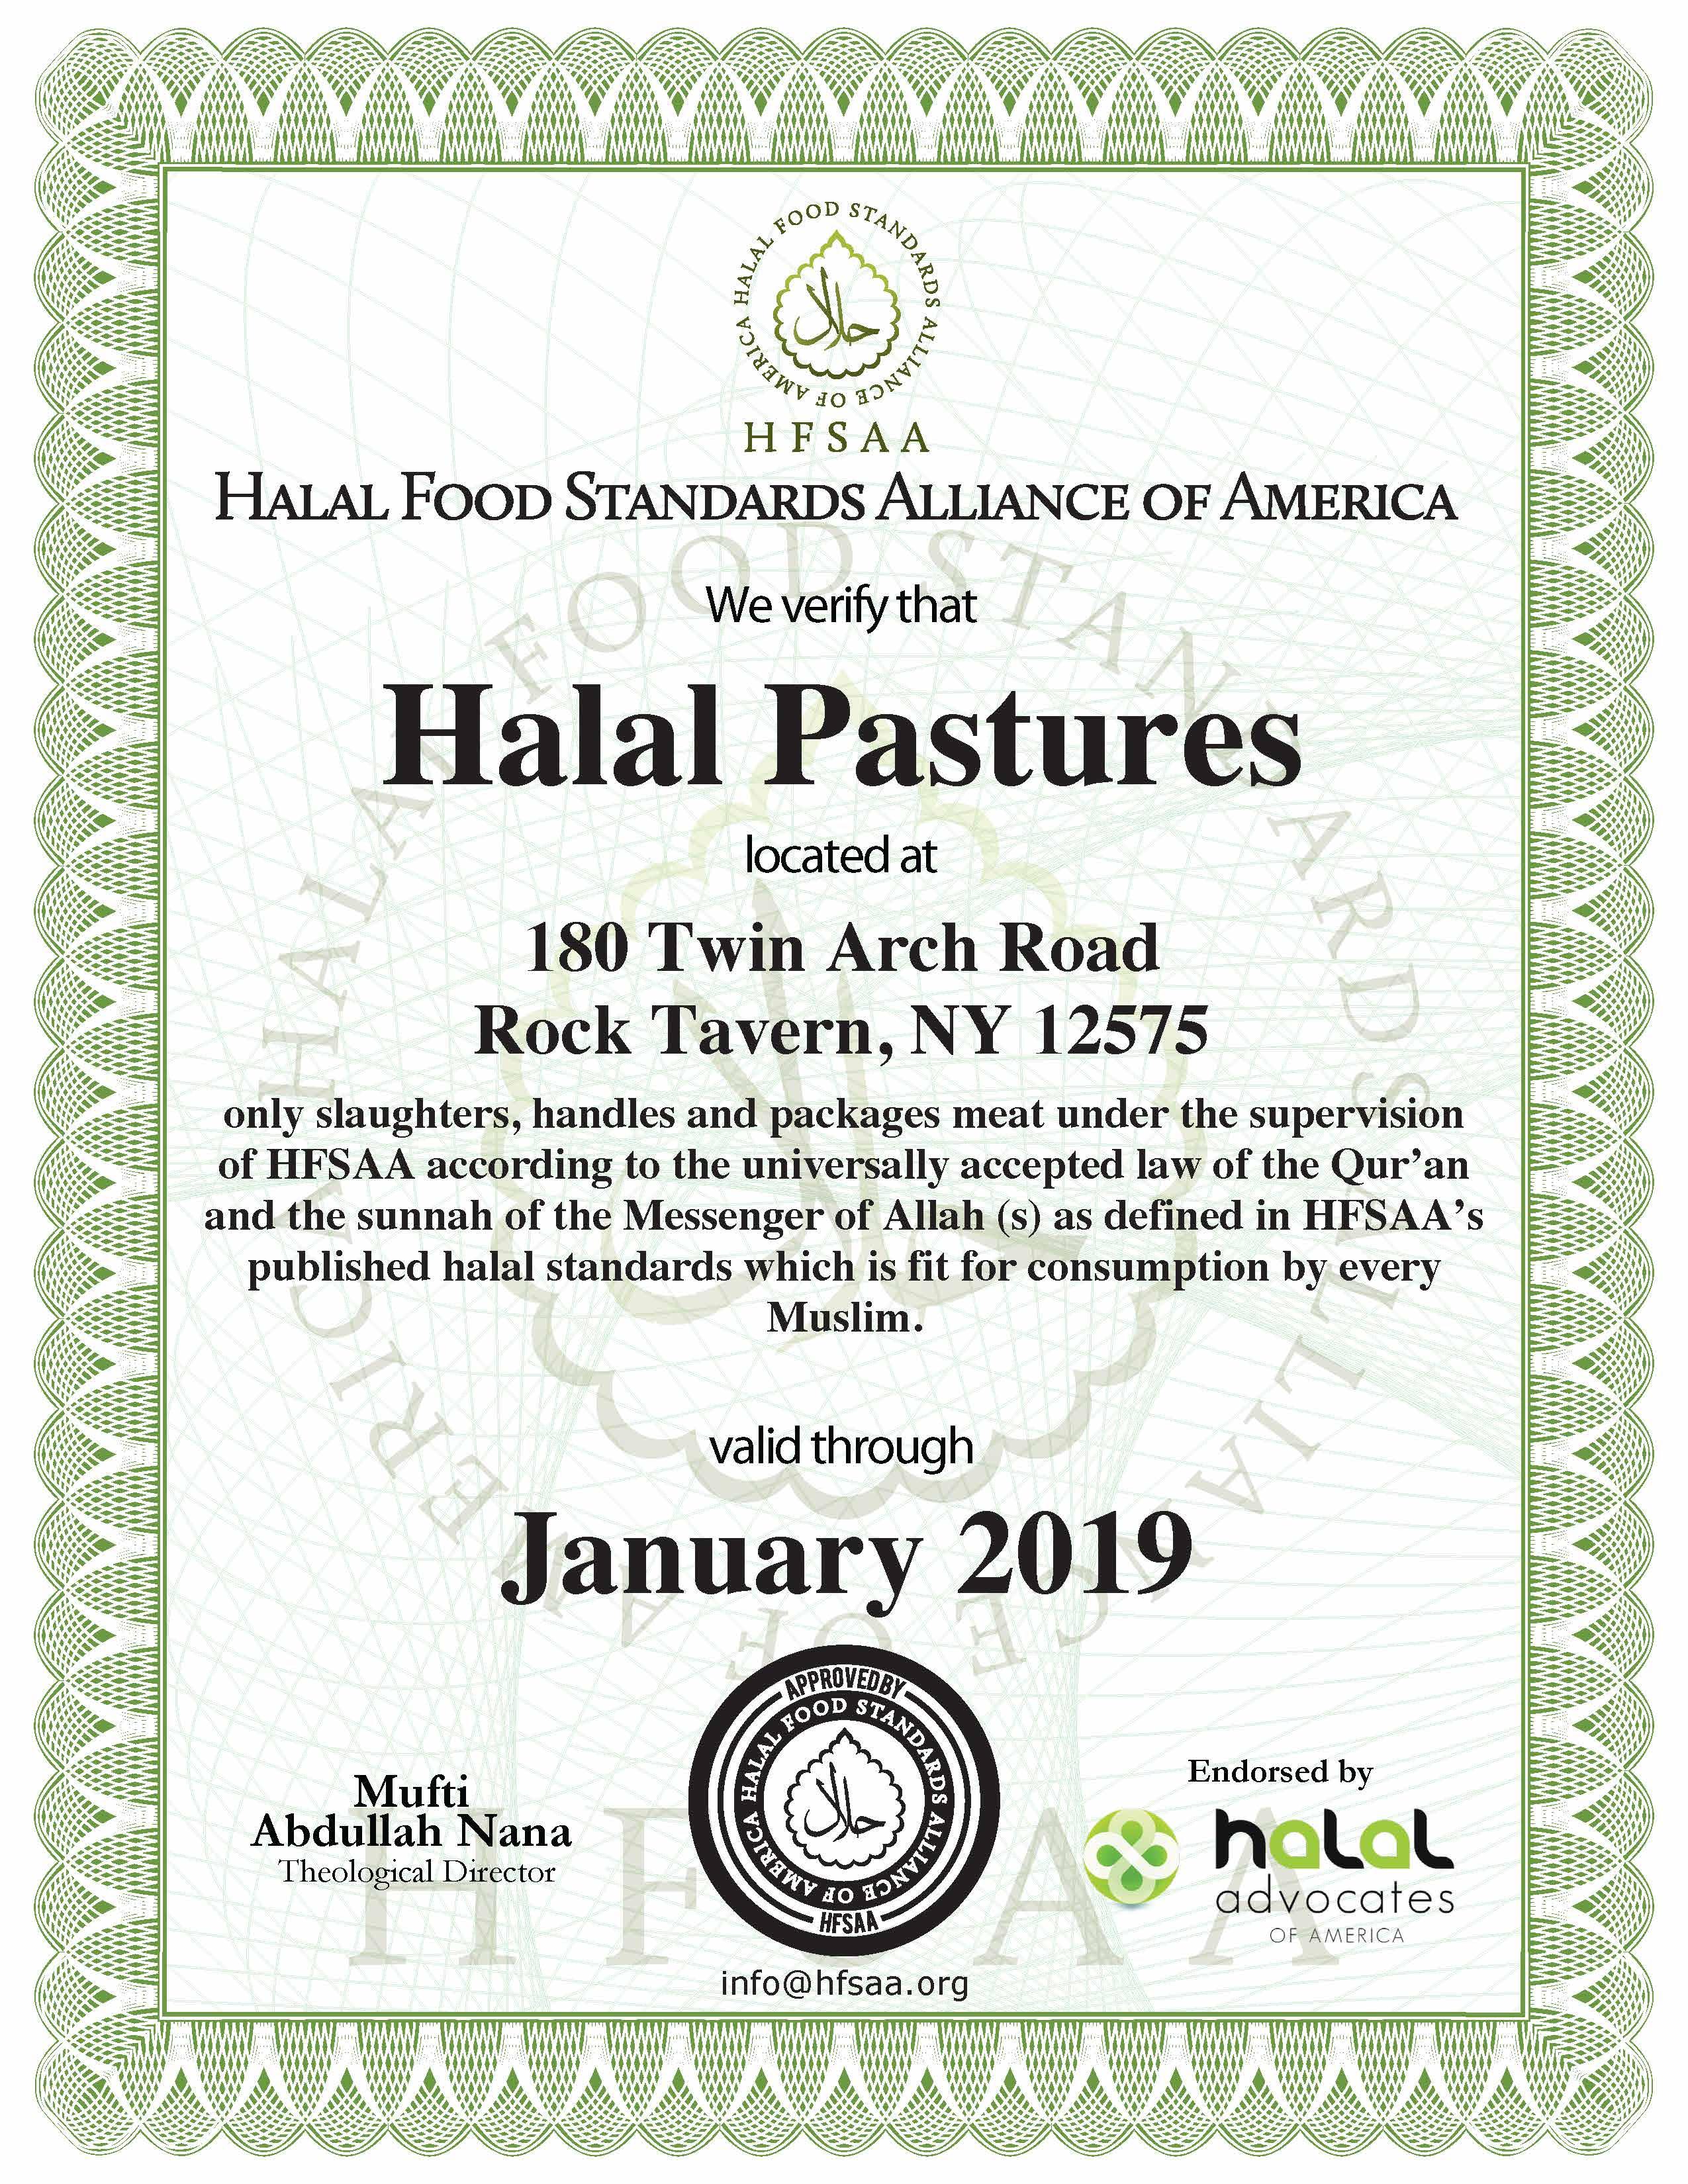 halal-pastures-january-2019-certificate.jpg